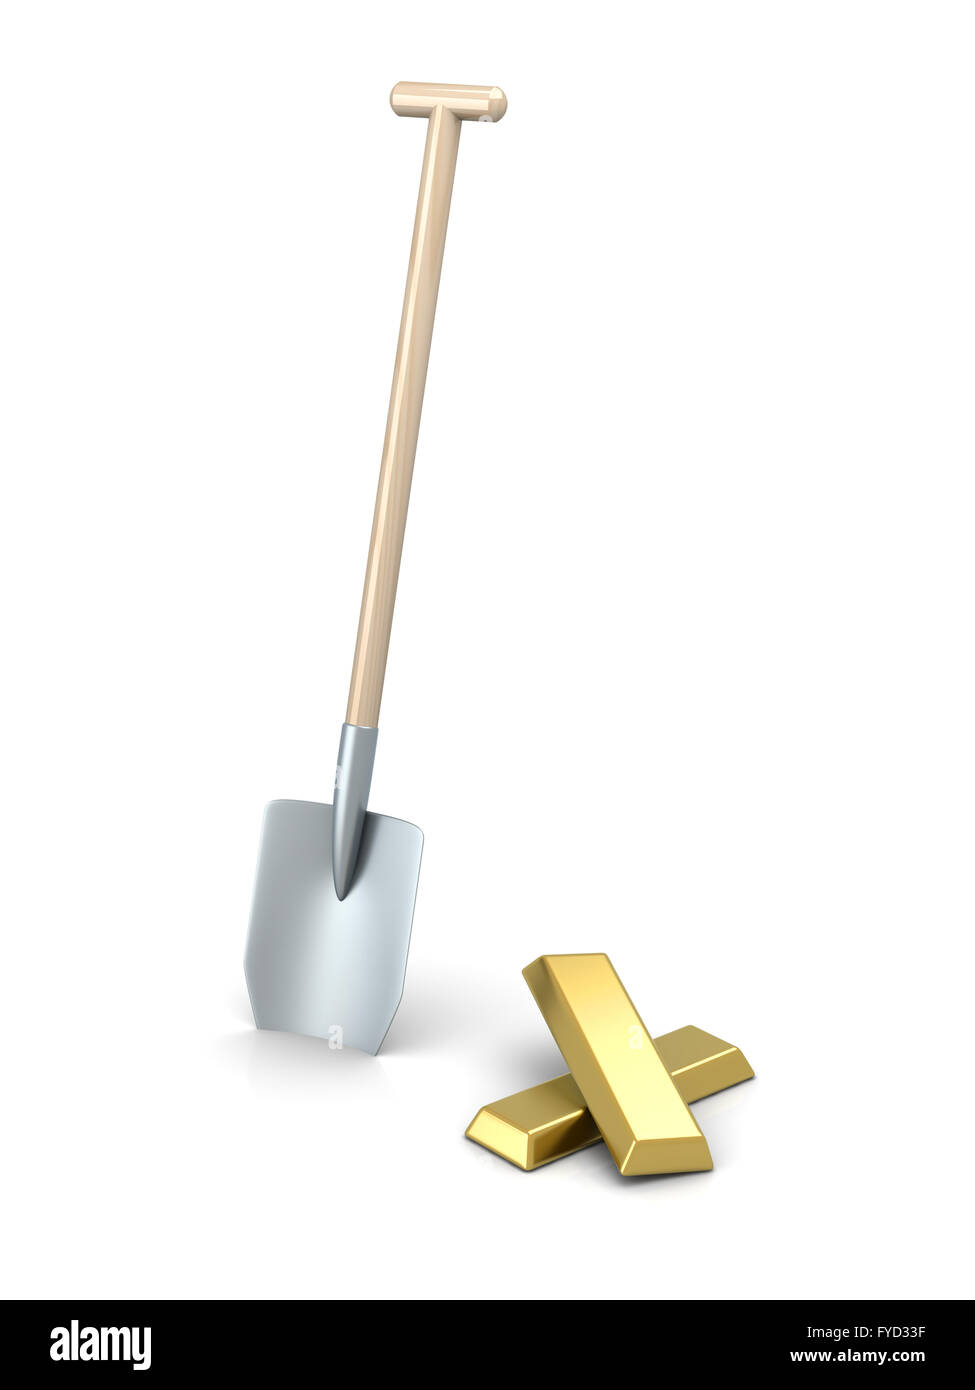 Gold Mining - Stock Image